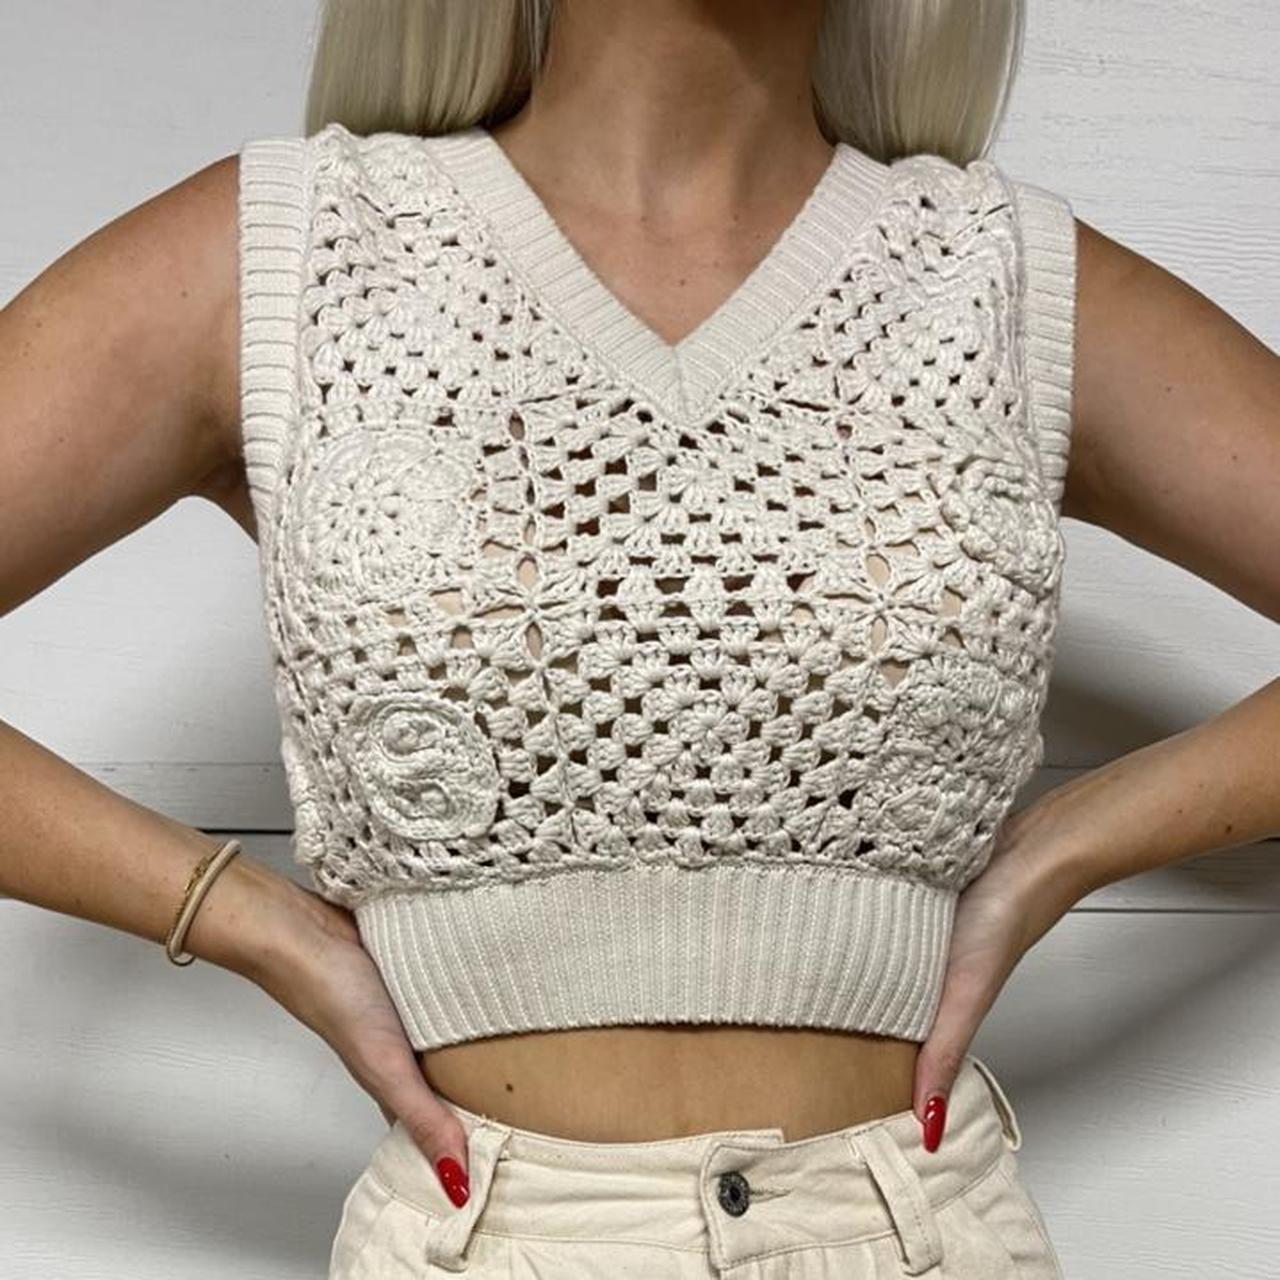 Product Image 1 - Staud Crochet Top!   Super cute